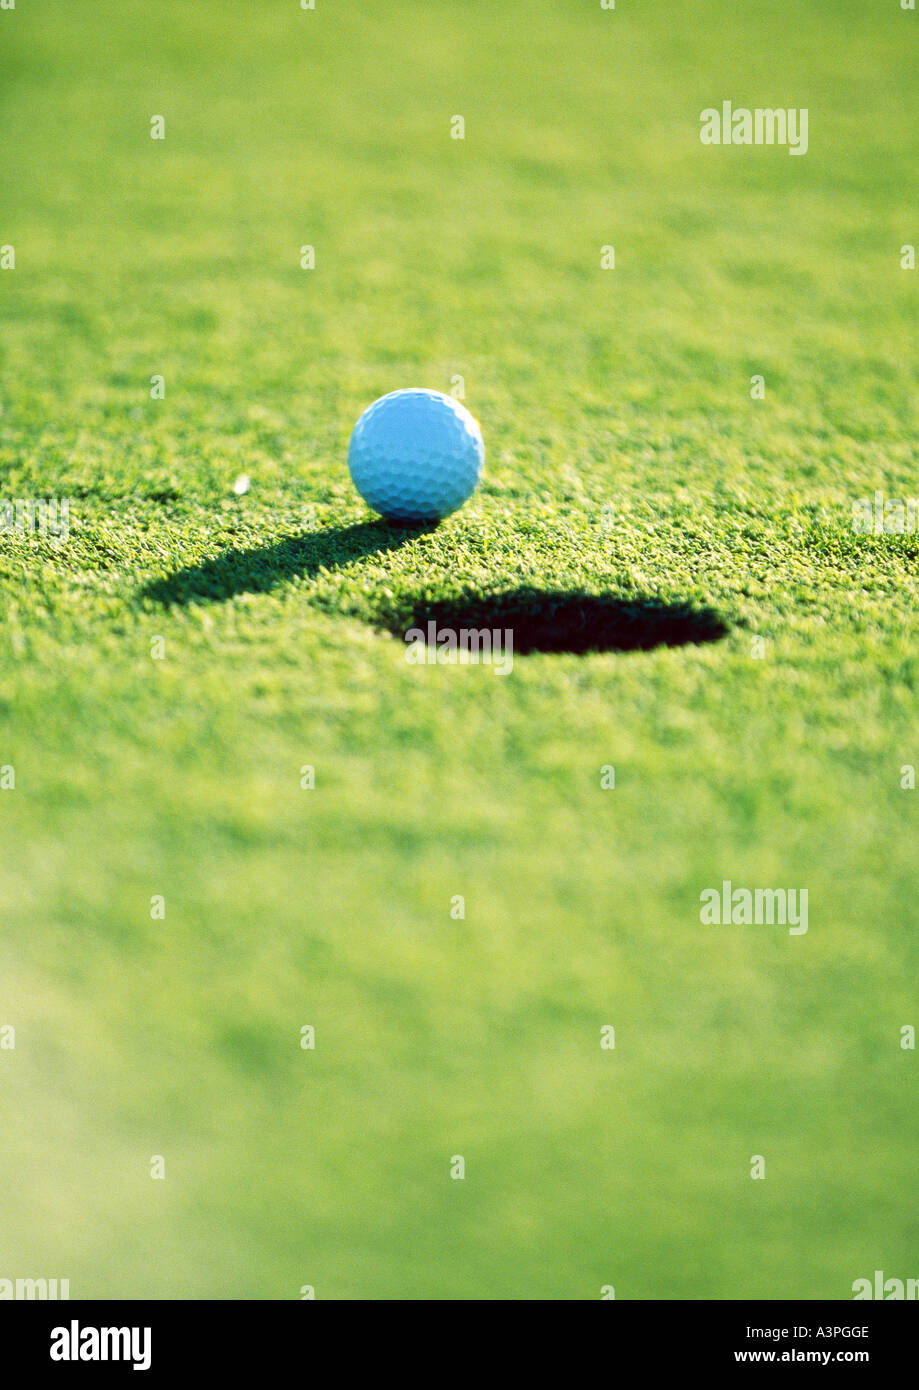 Golf ball near hole, close-up - Stock Image